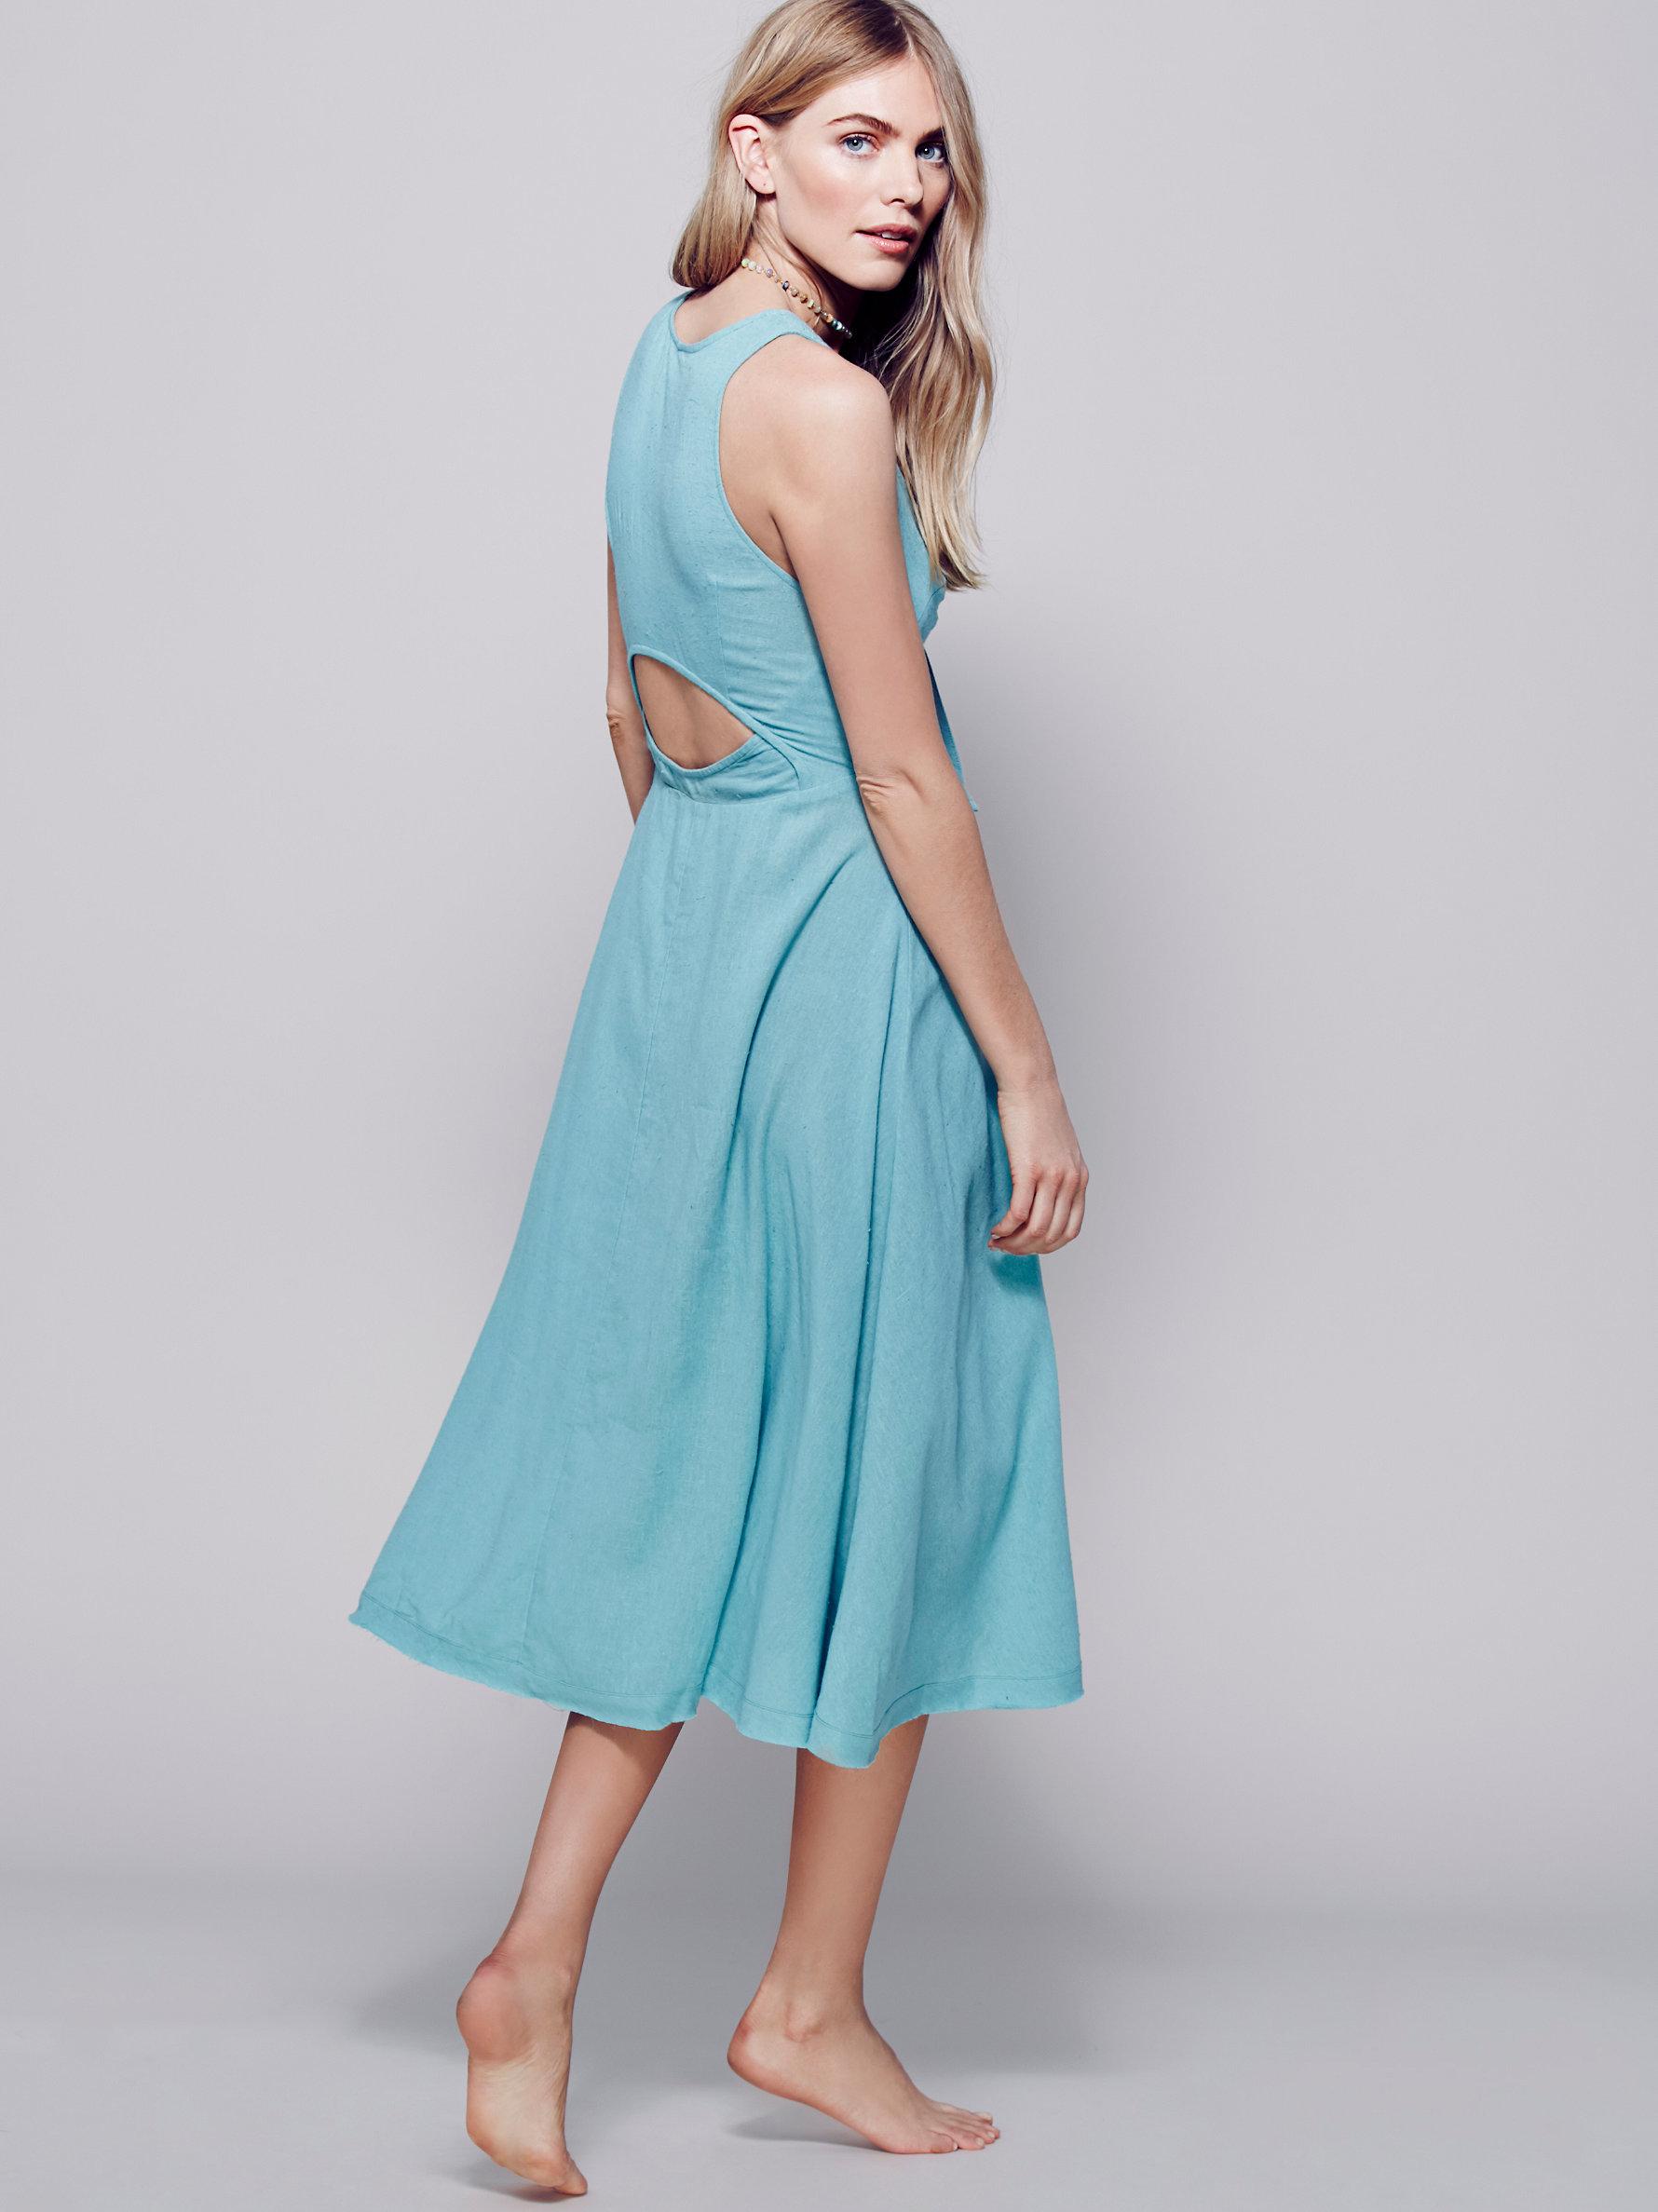 Nice Prom Dress Shops In Birmingham Uk Contemporary - Wedding Ideas ...